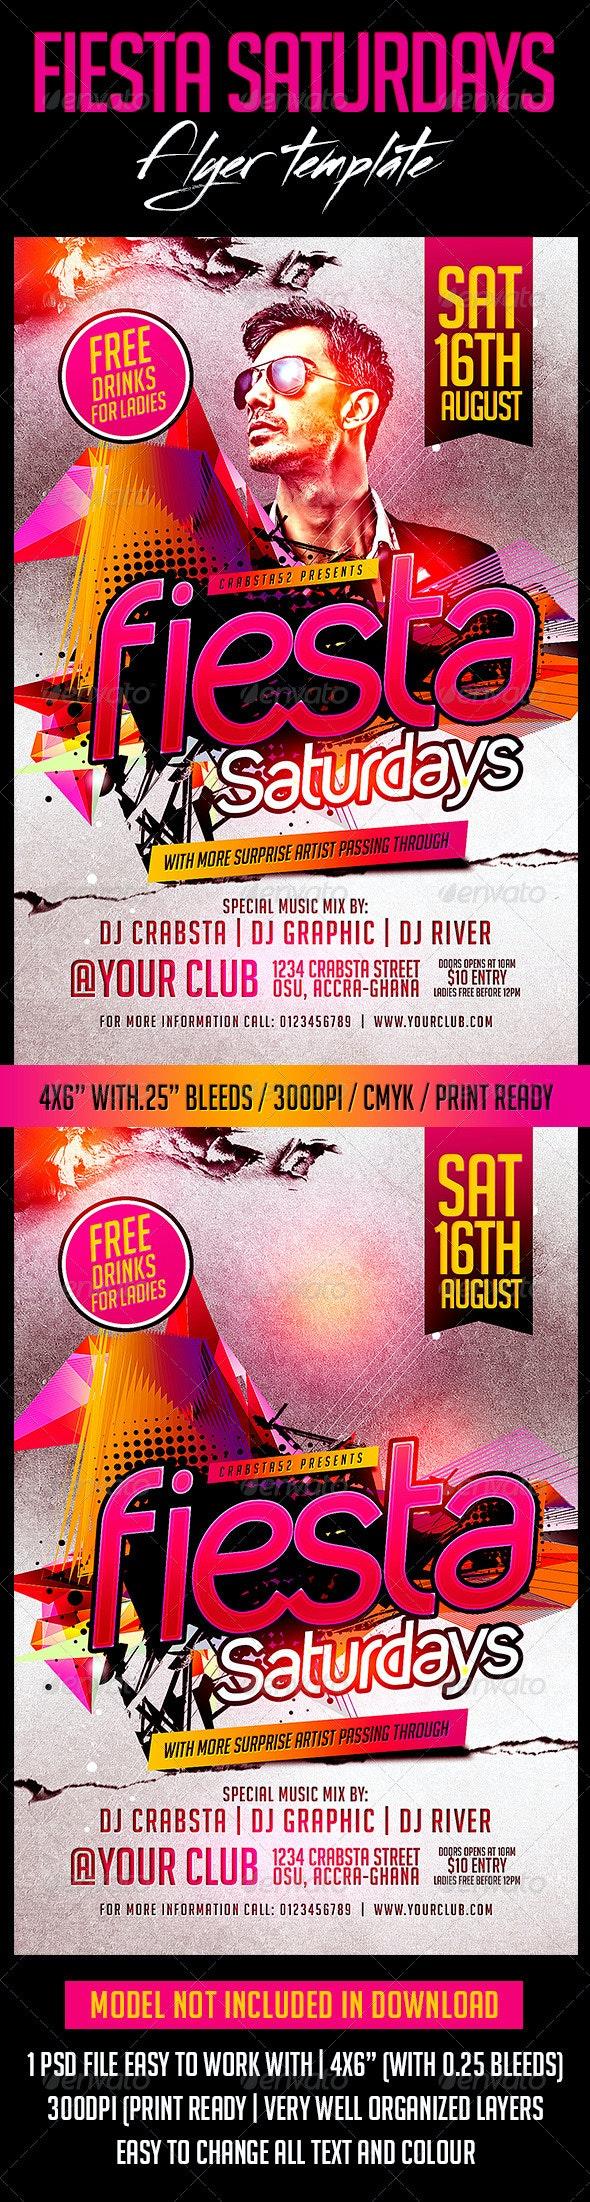 Fiesta Saturdays Flyer Template  - Flyers Print Templates